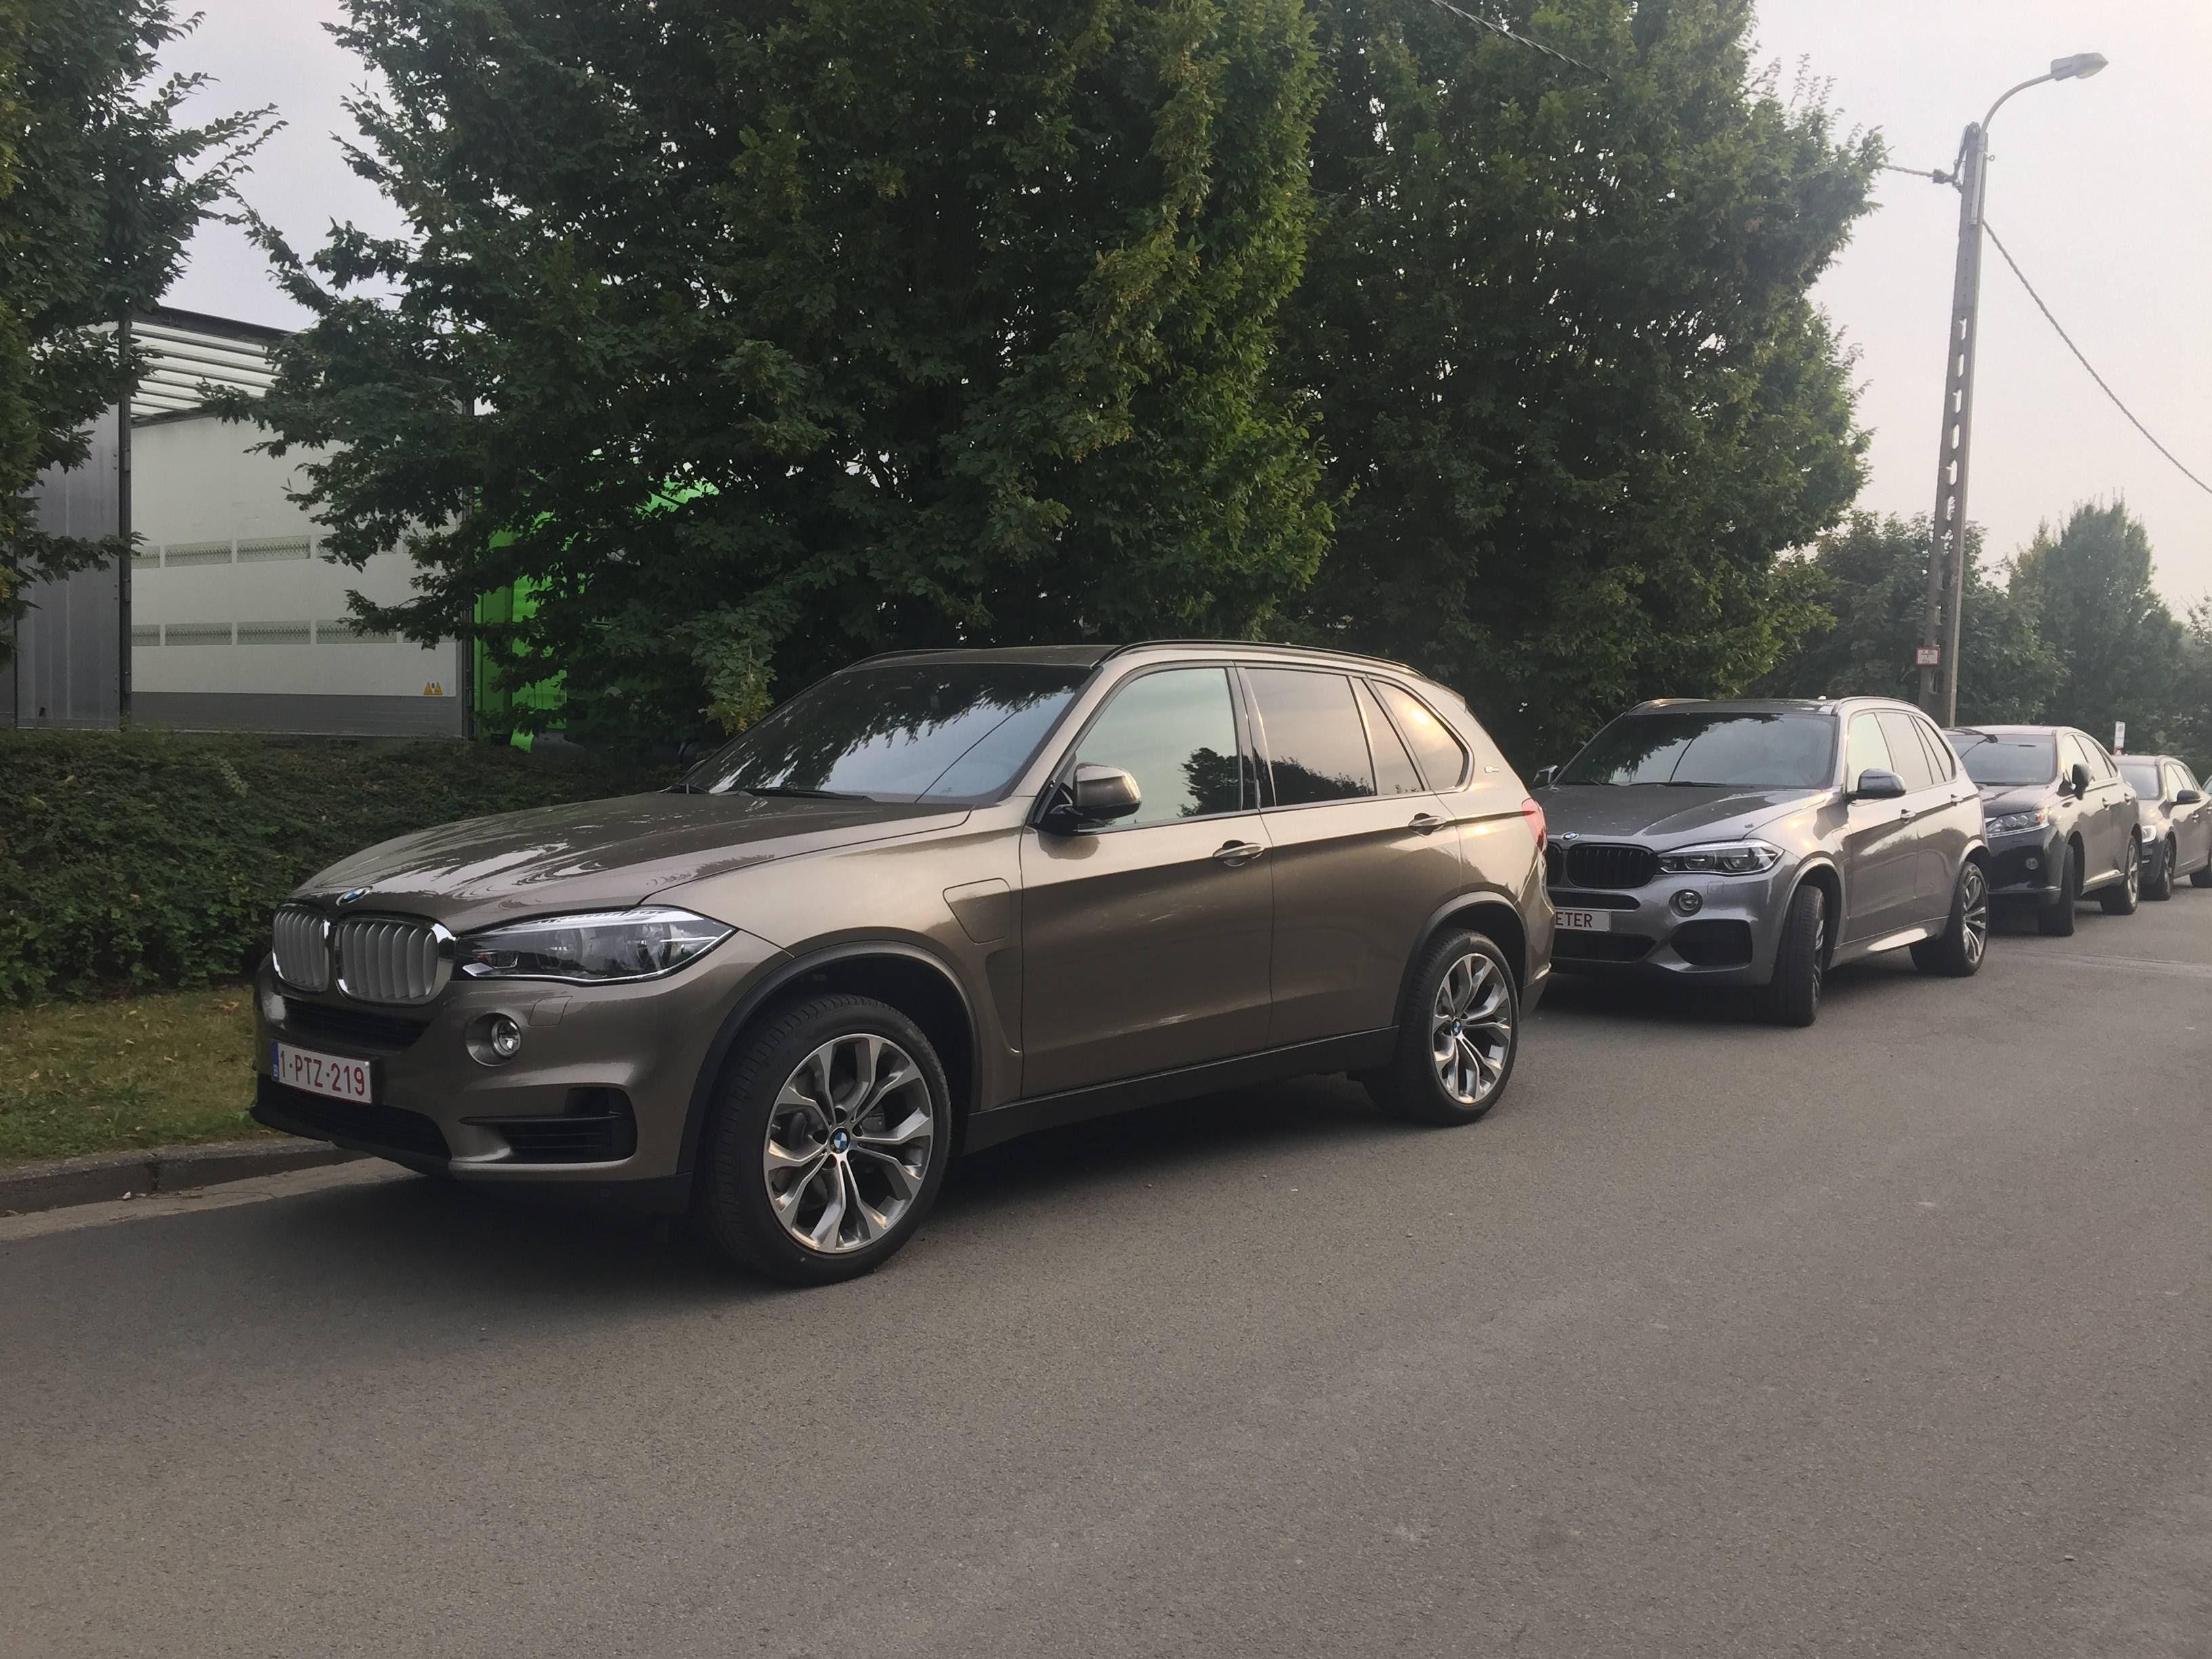 BMW X5 and X6 Forum (F15/F16) - View Single Post - Random X5 shot of ...